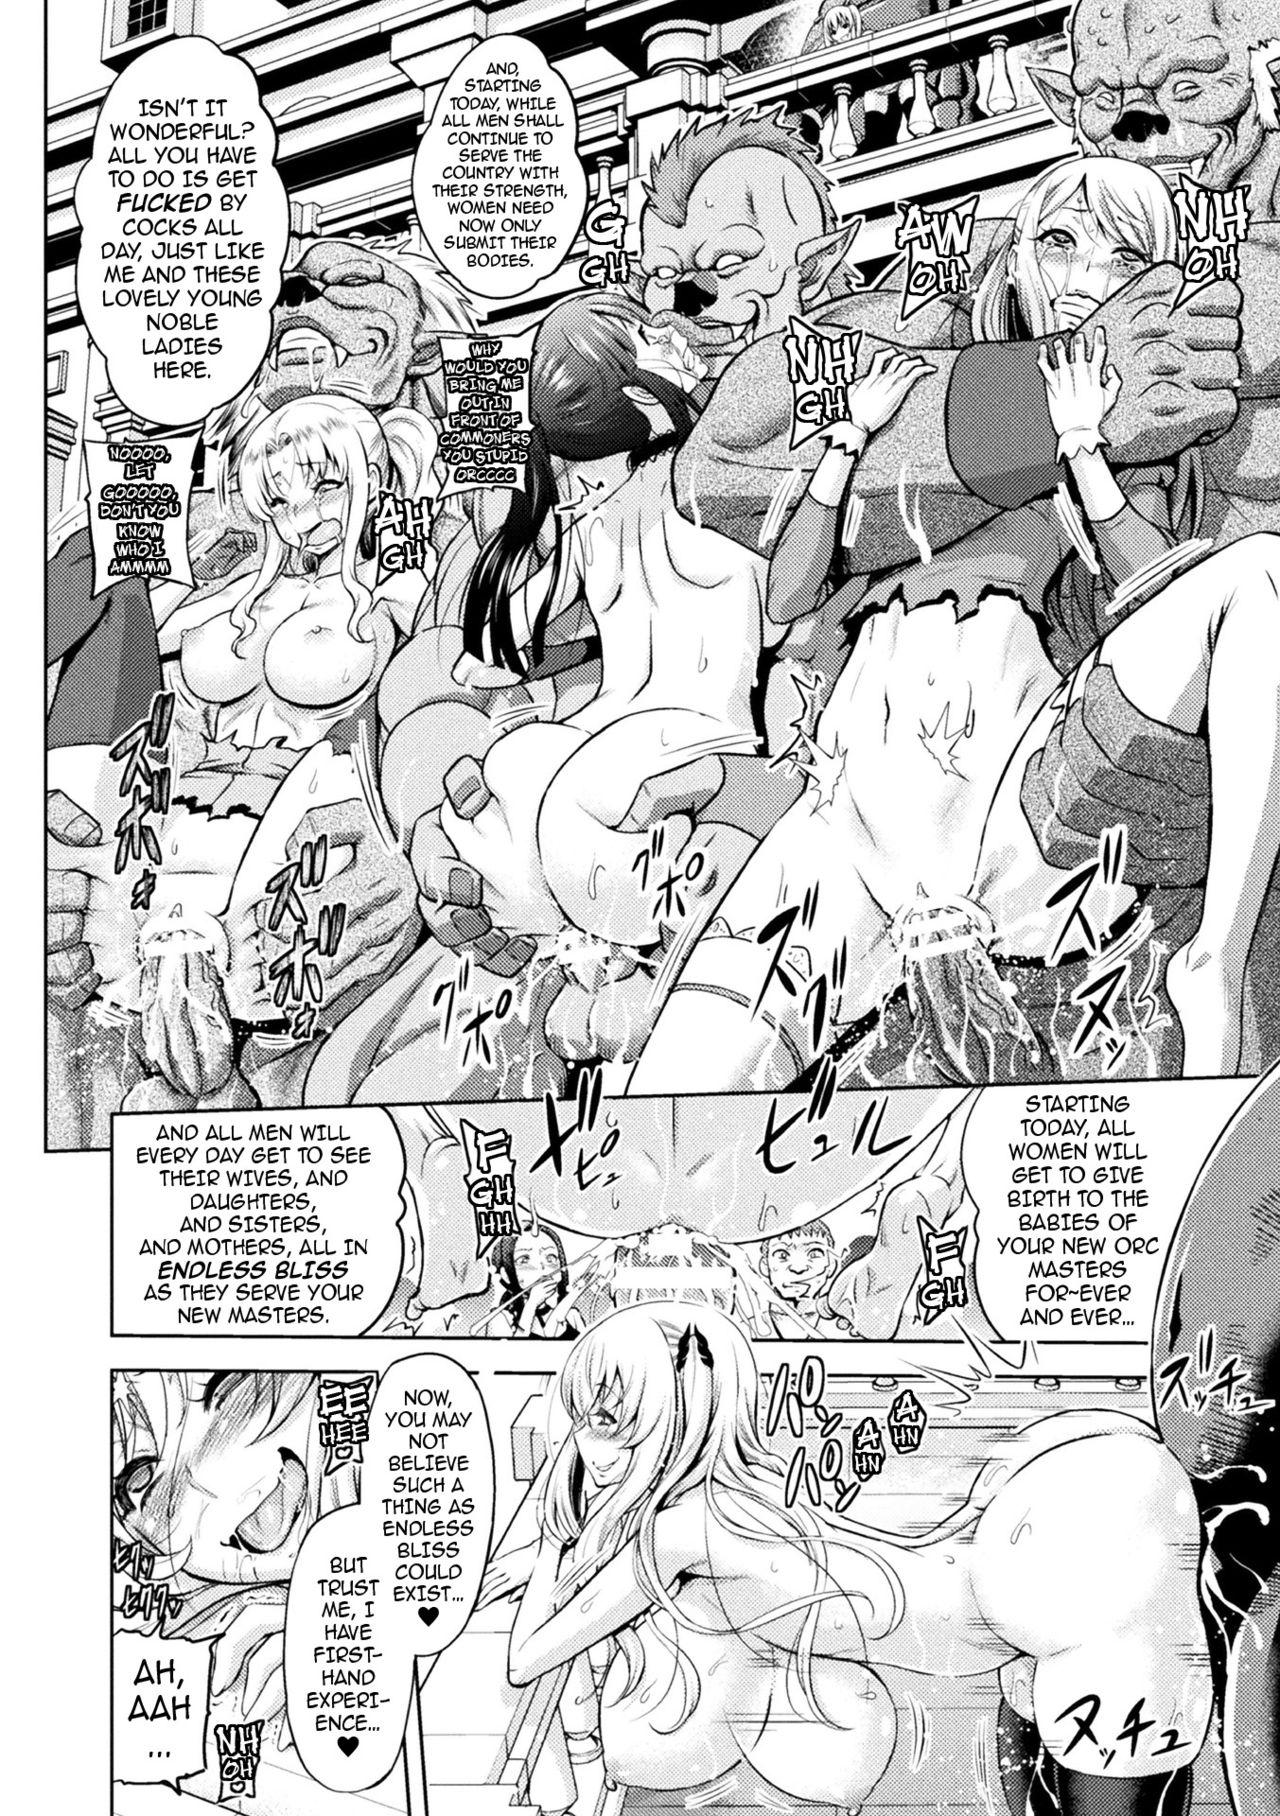 [Yamada Gogogo] Erona ~Orc no Inmon ni Okasareta Onna Kishi no Matsuro~ | Erona ~The Fall of a Beautiful Knight Cursed with the Lewd Mark of an Orc~ [English] {darknight} 102